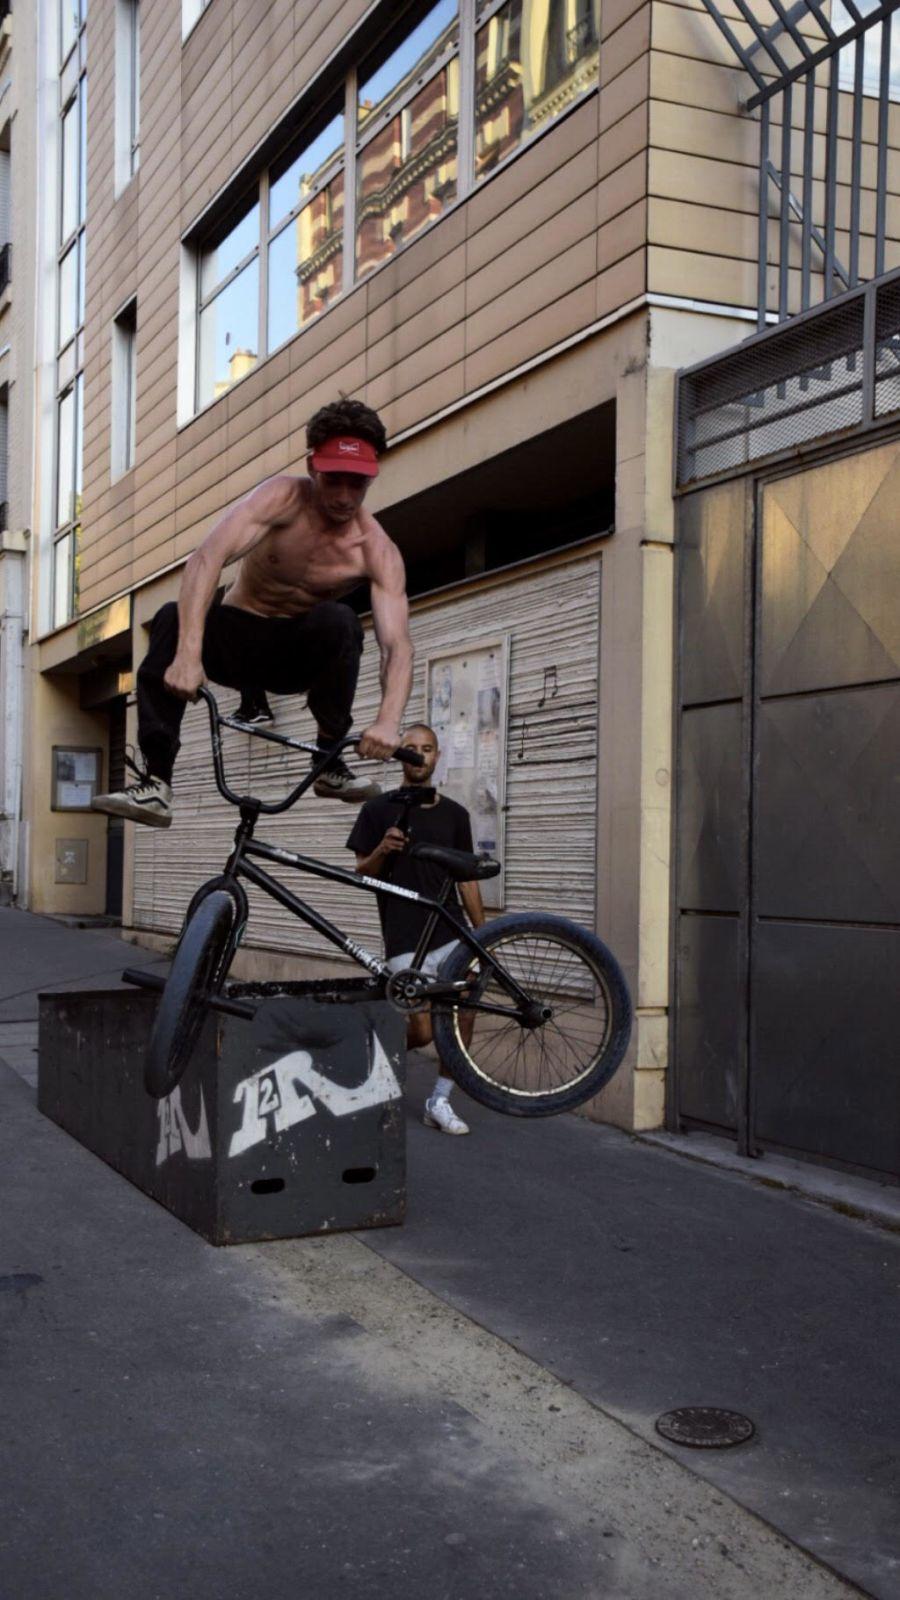 Superbe_media_urbain_paris_lifestyle_france_performance_bmx-17